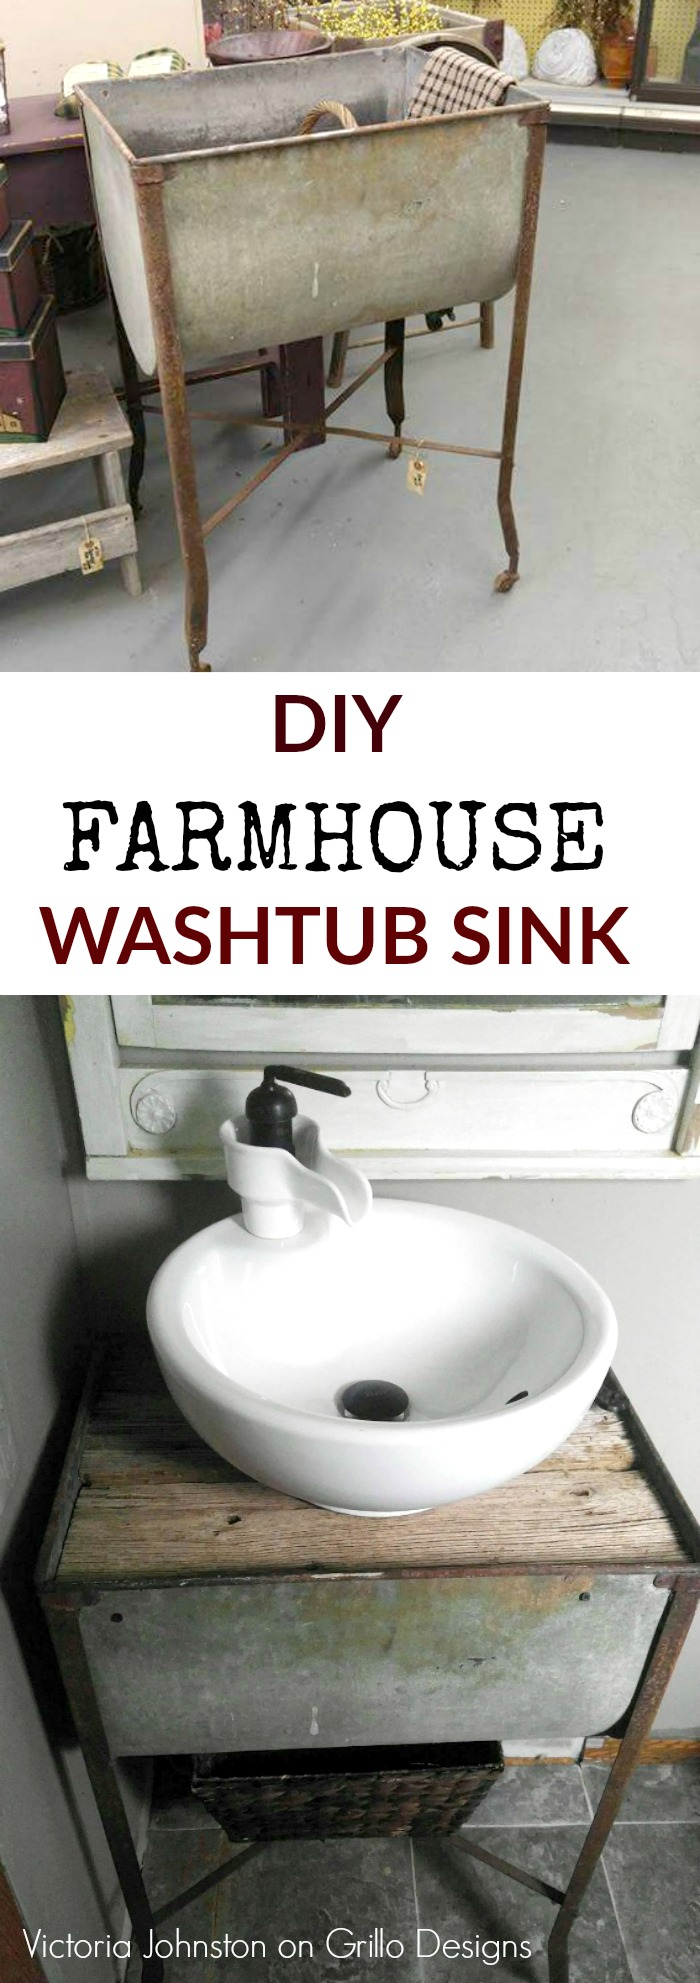 DIY FARMHOUSE WASHTUB SINK Pinterest